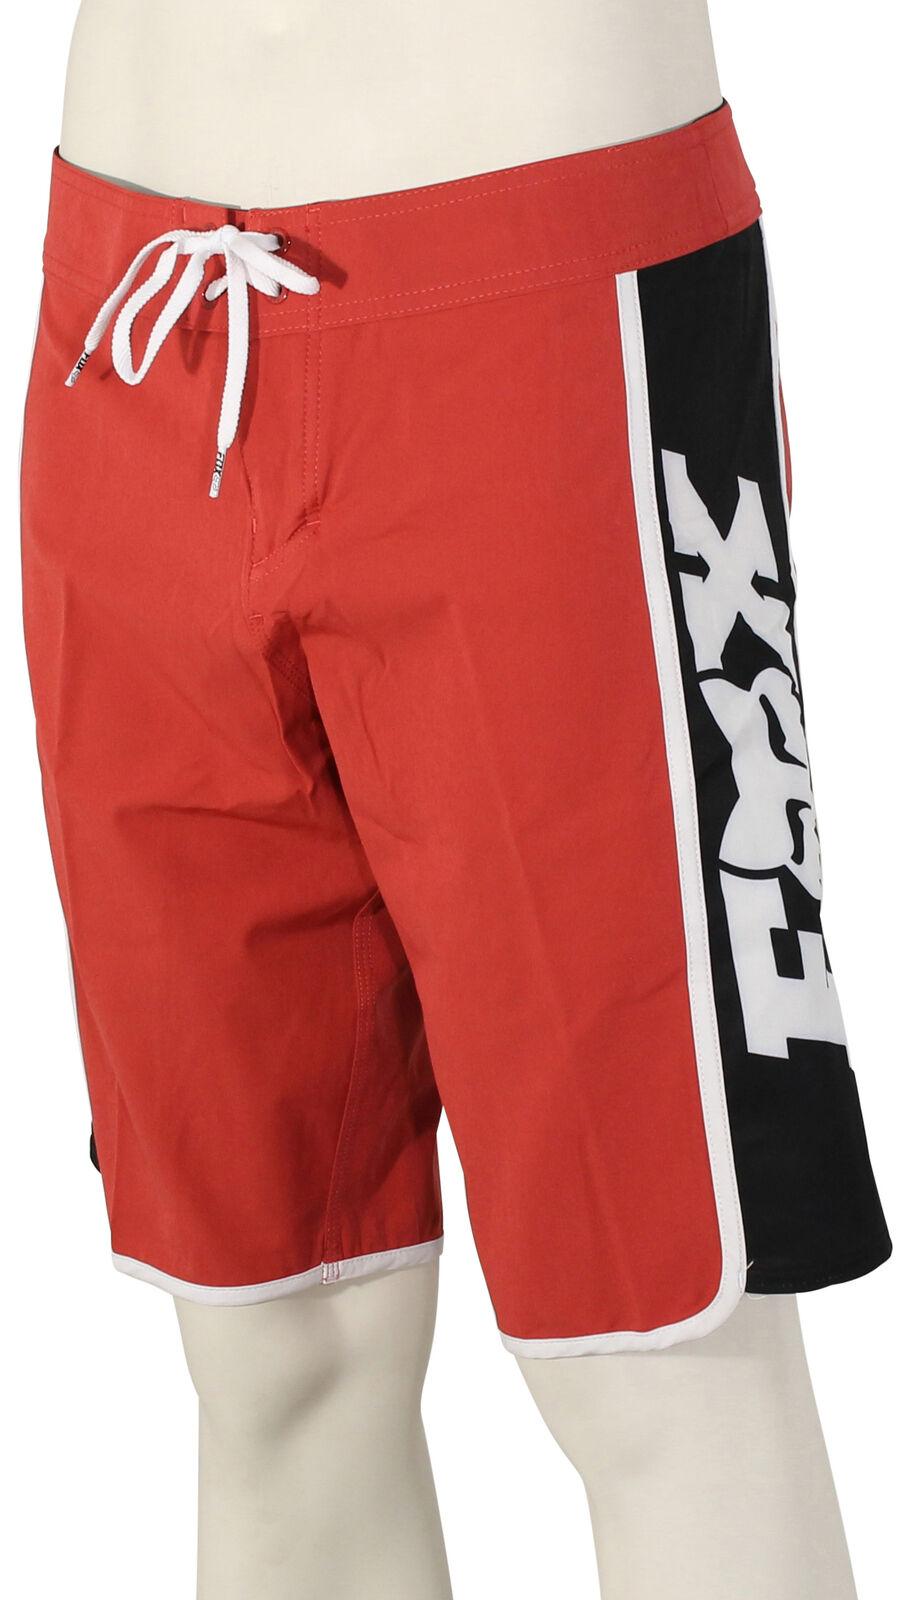 Fox Race Team Stretch Boardshorts - Rio Red - New